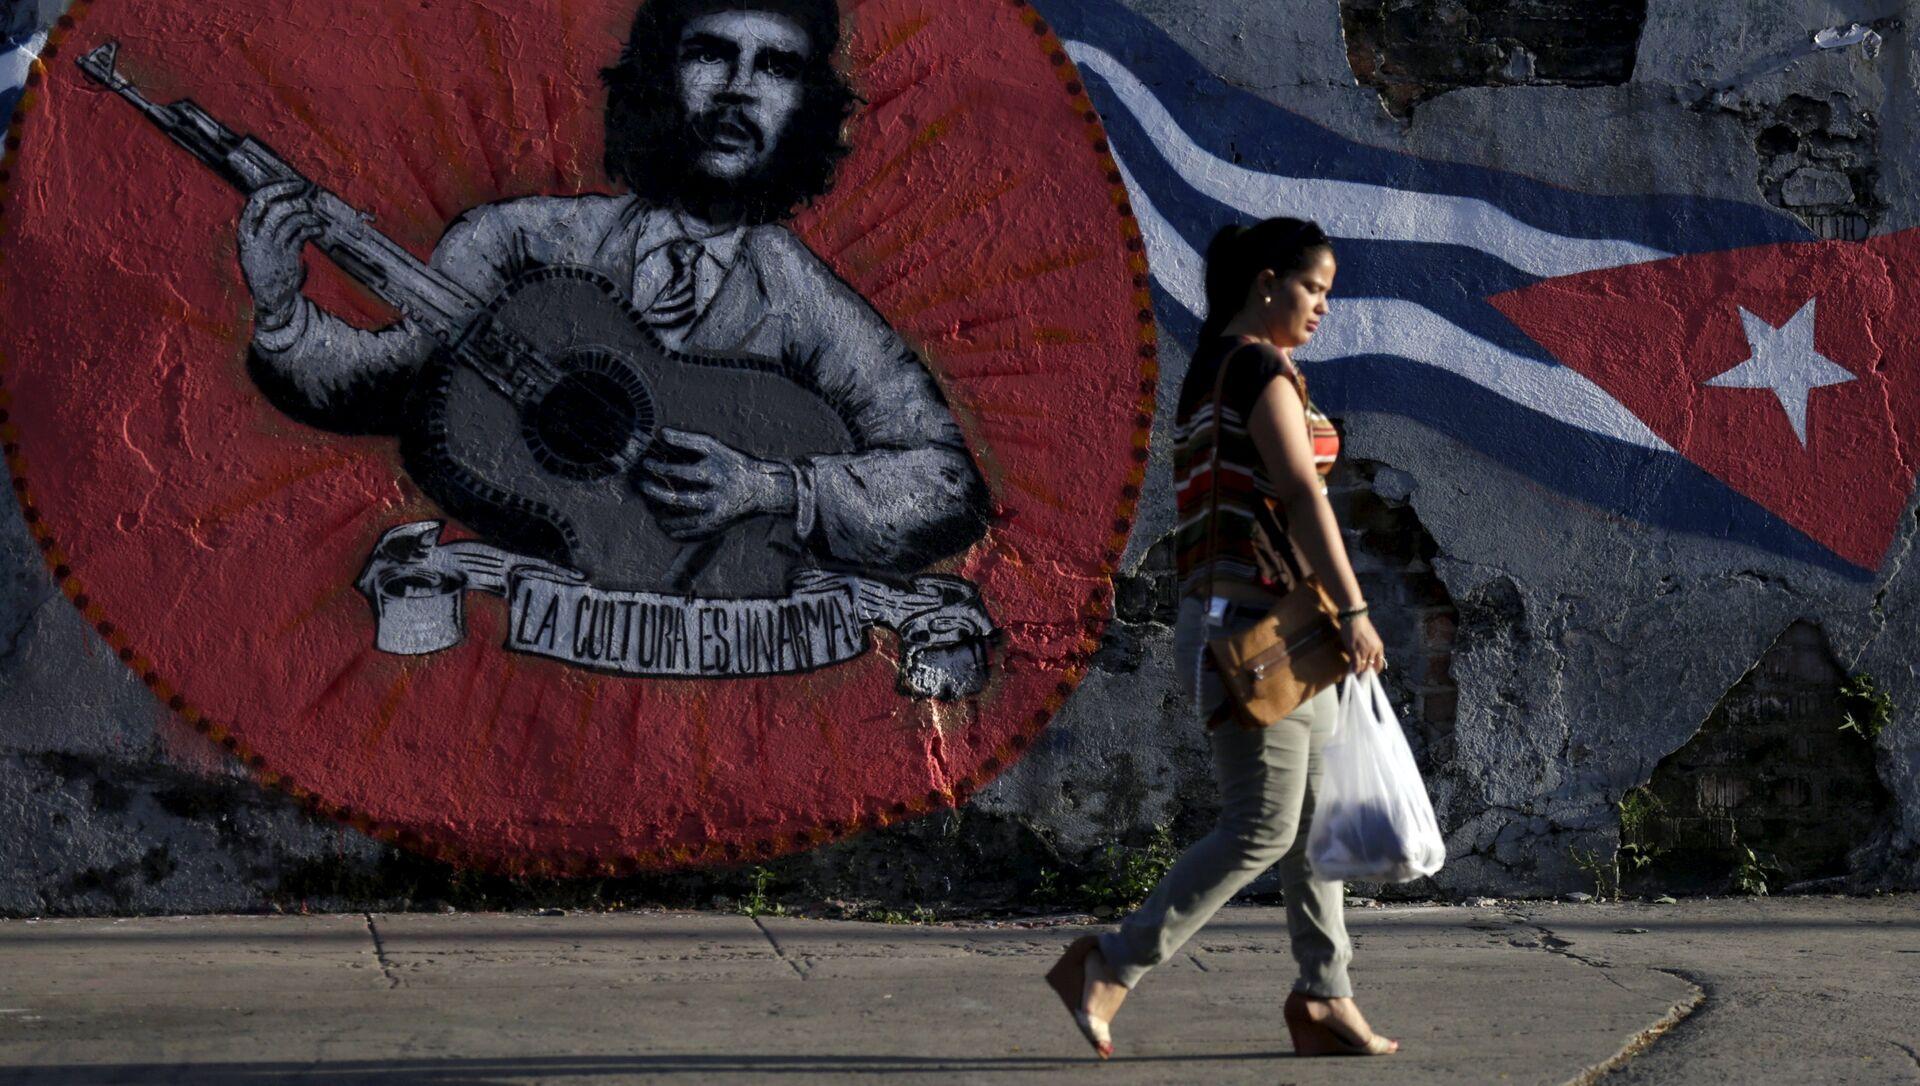 Grafiti en Cuba (archivo) - Sputnik Mundo, 1920, 08.02.2021